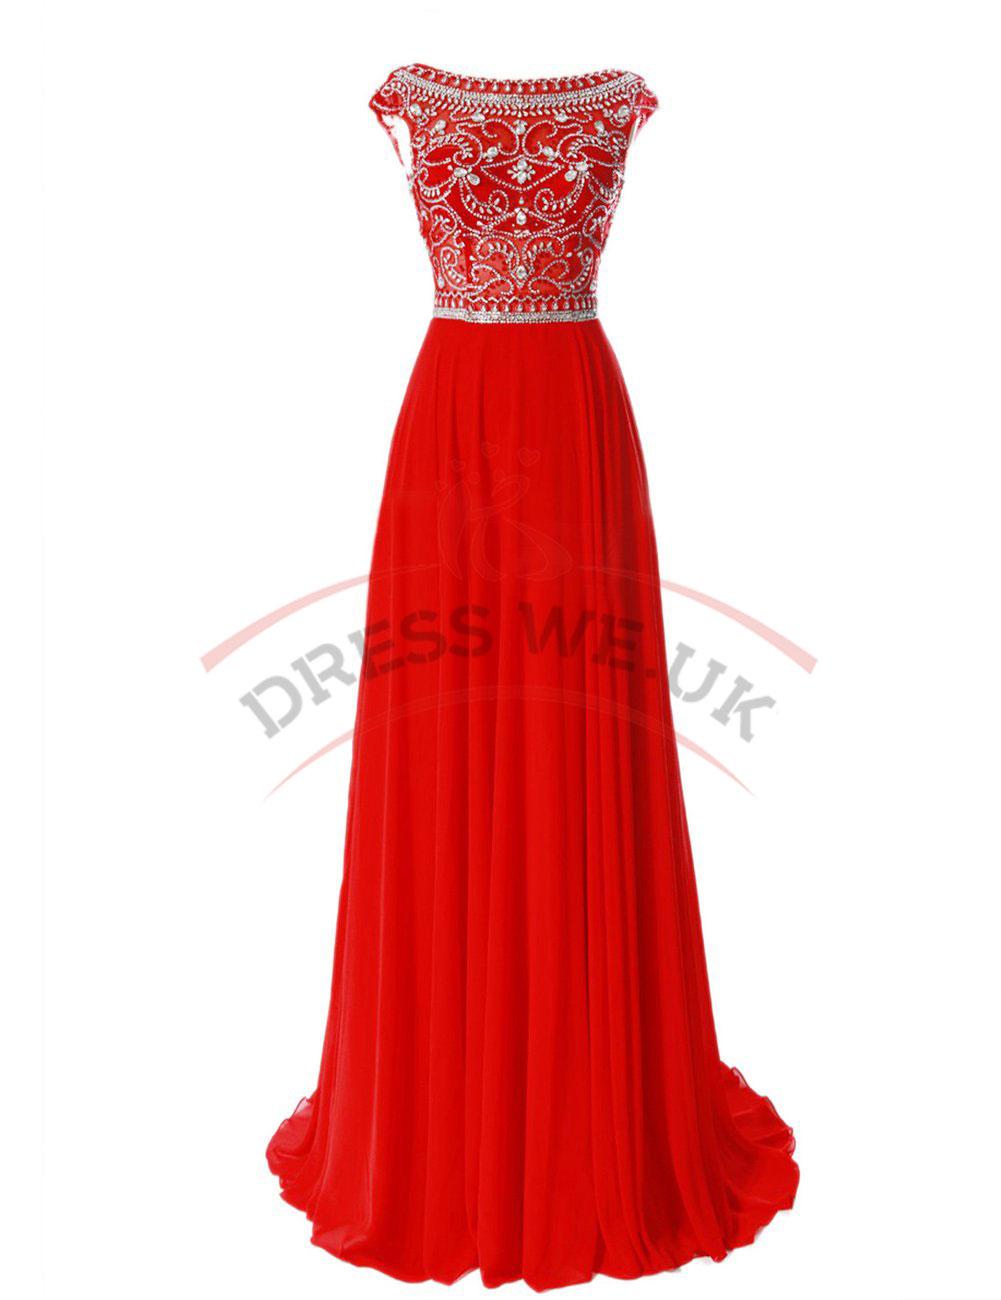 Elegant Red Prom Dresses,Floor Length Prom Dresses,Chiffon Prom ...